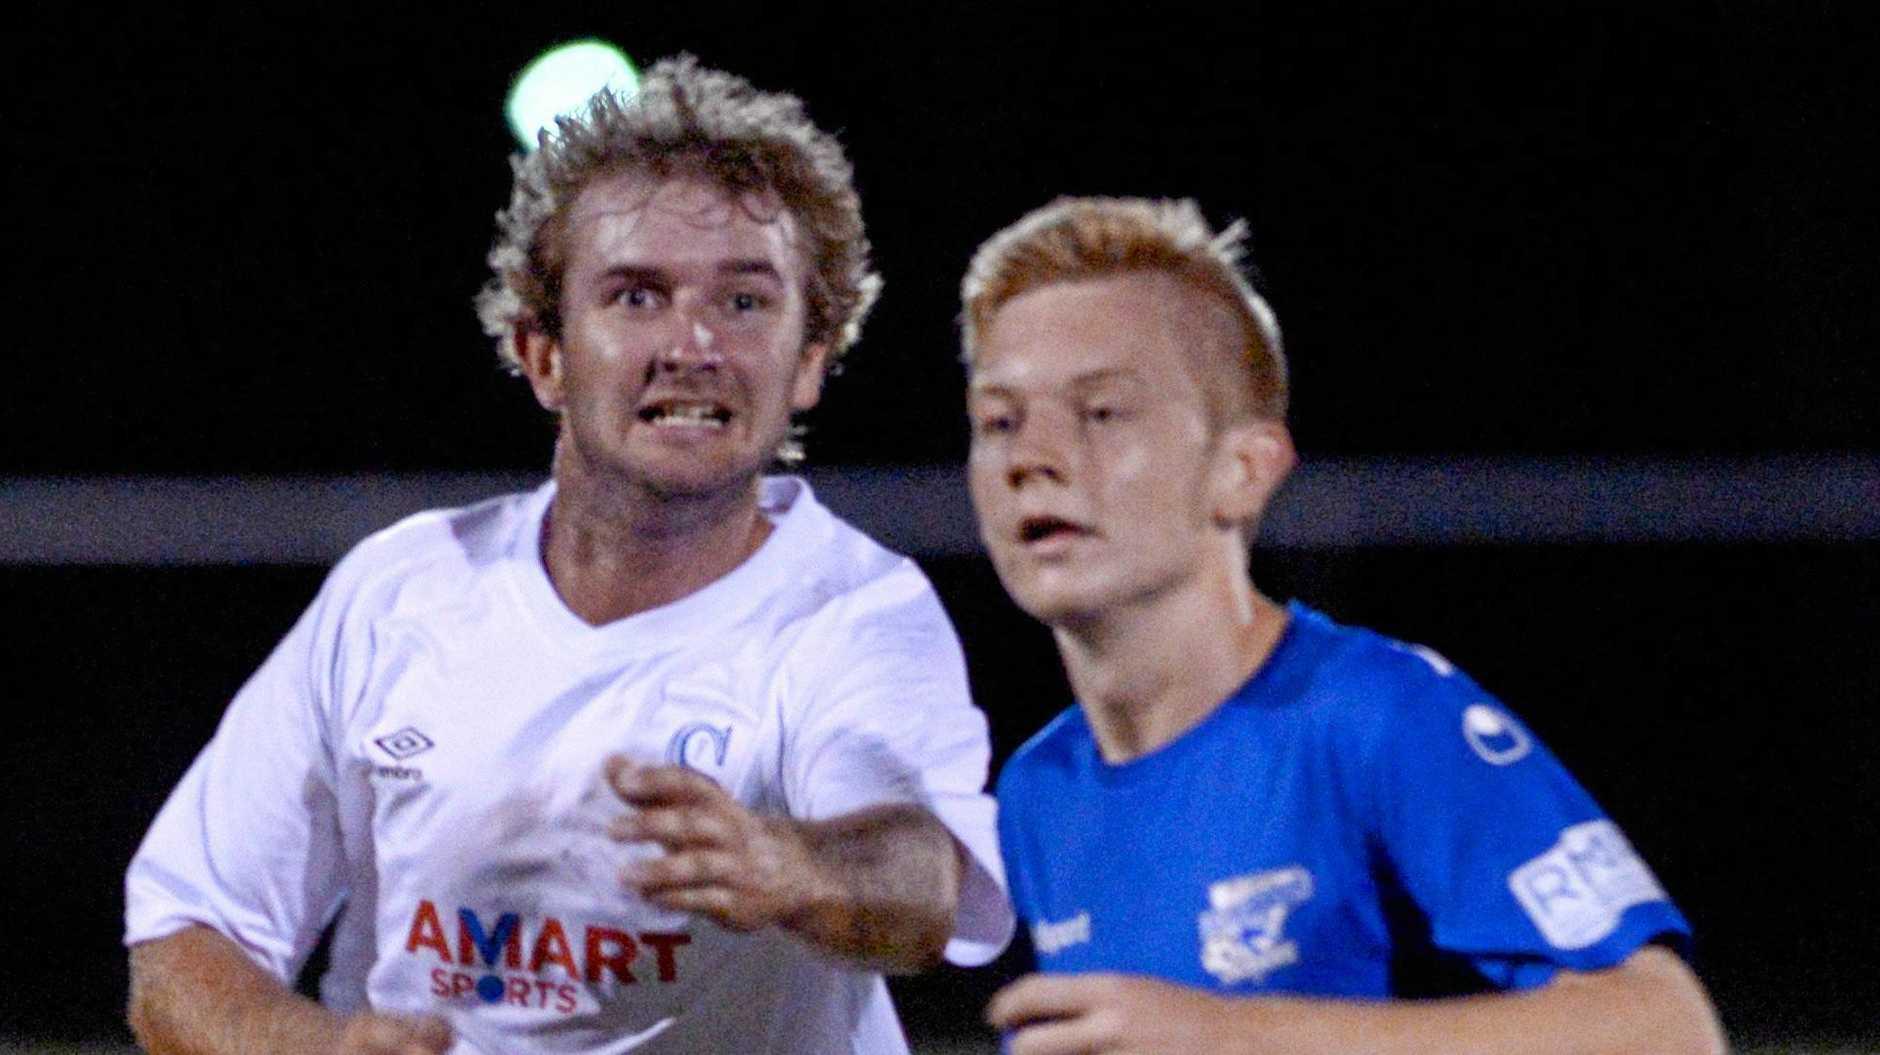 FOOTBALL FFA CUP: Sunbury Blues' Lachlan Reinikka and Bluebirds United's Sam Skinner.